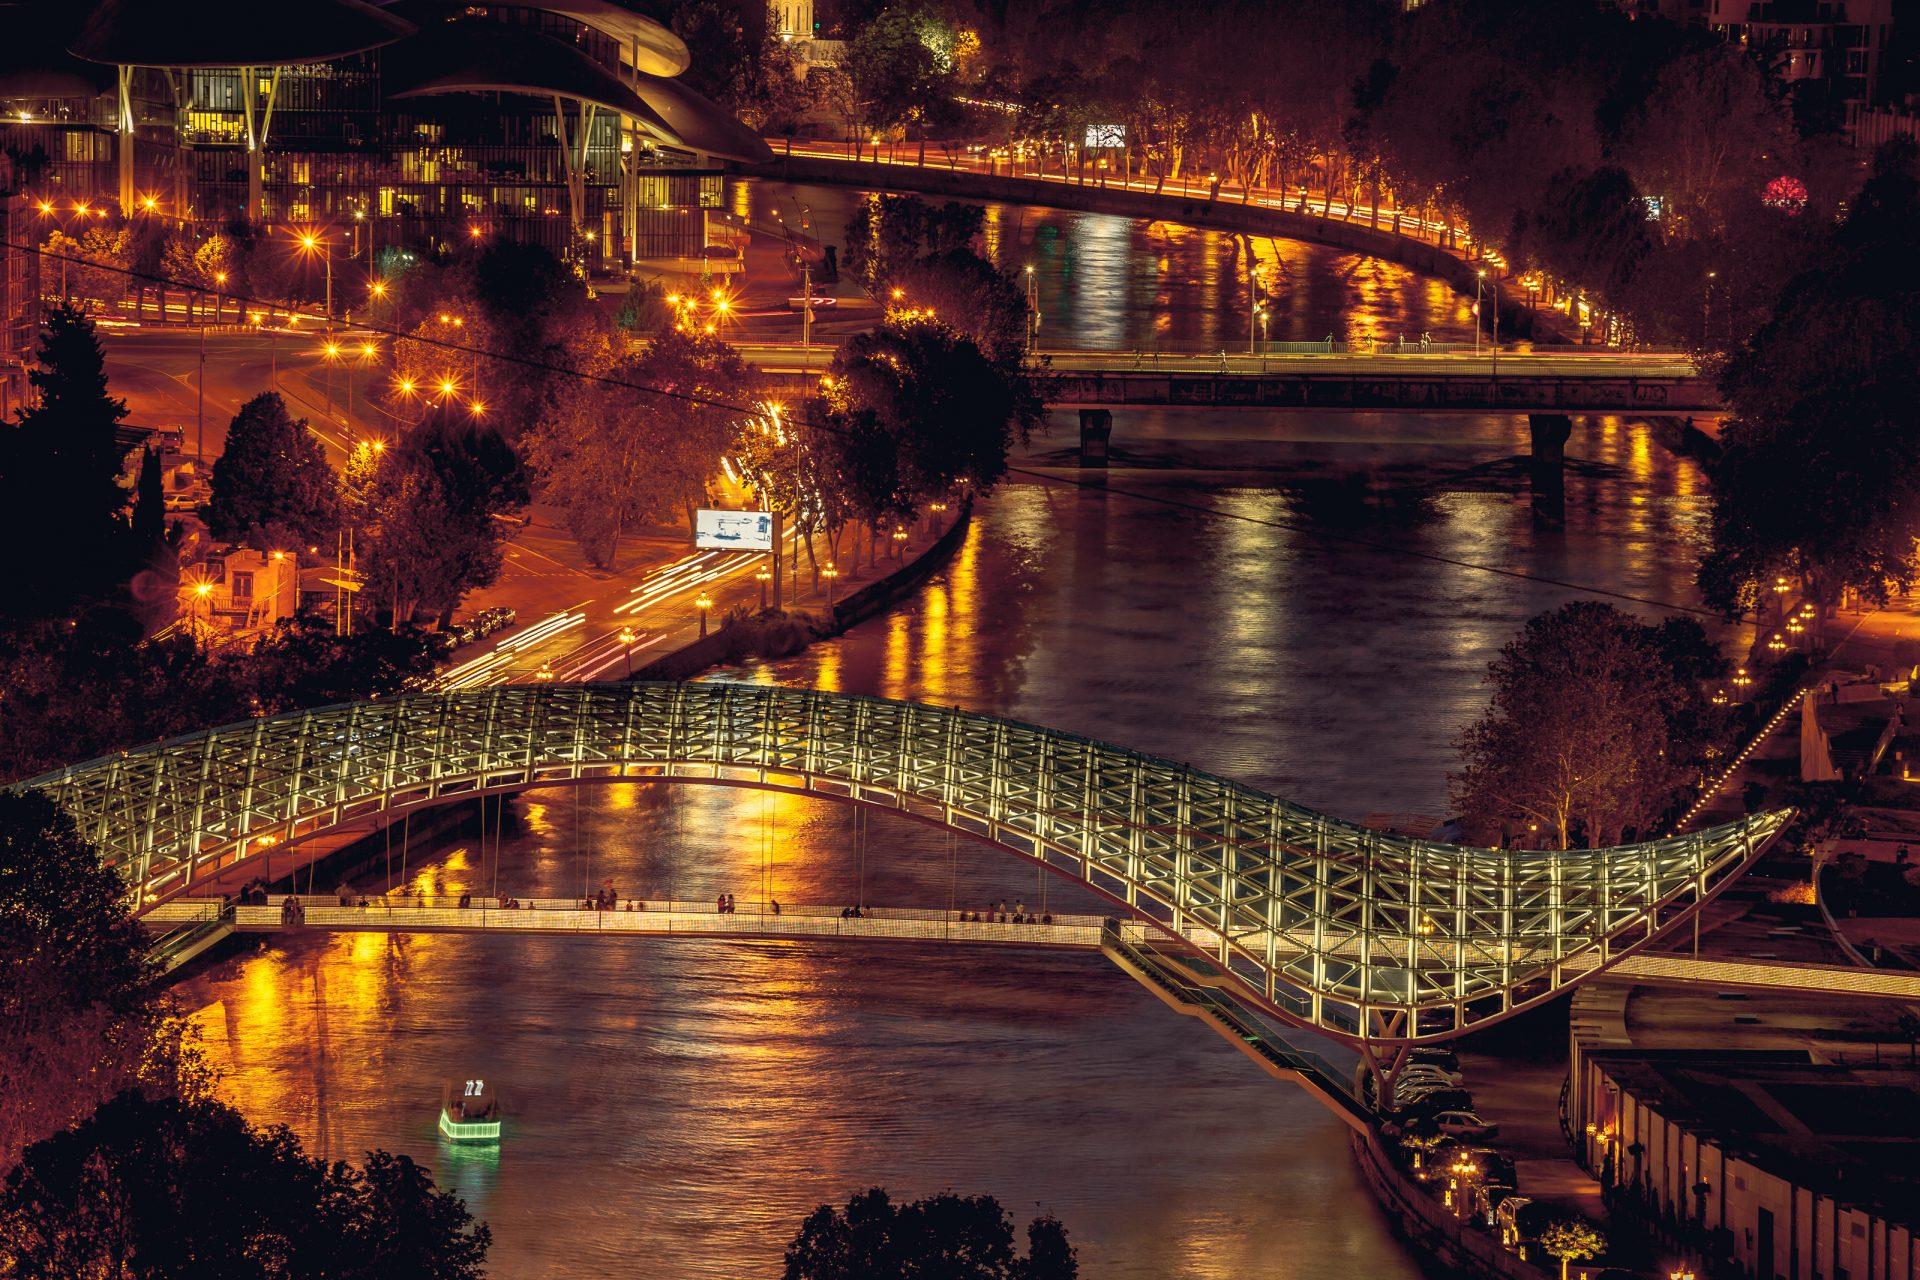 Bridges over the Kura light up at night in Tbilisi – Shutterstock